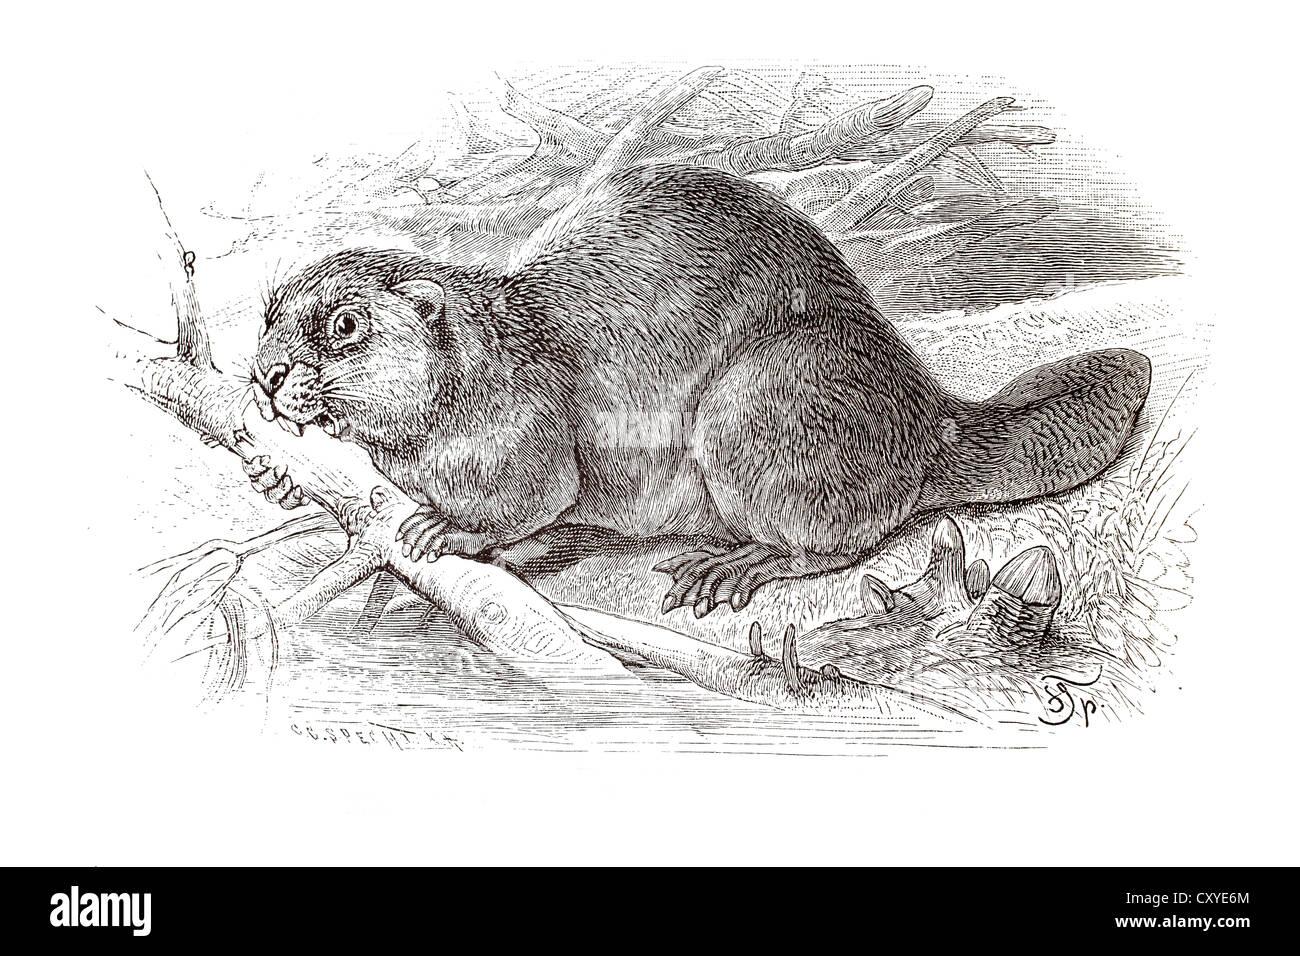 Copper engraving, beaver - Stock Image